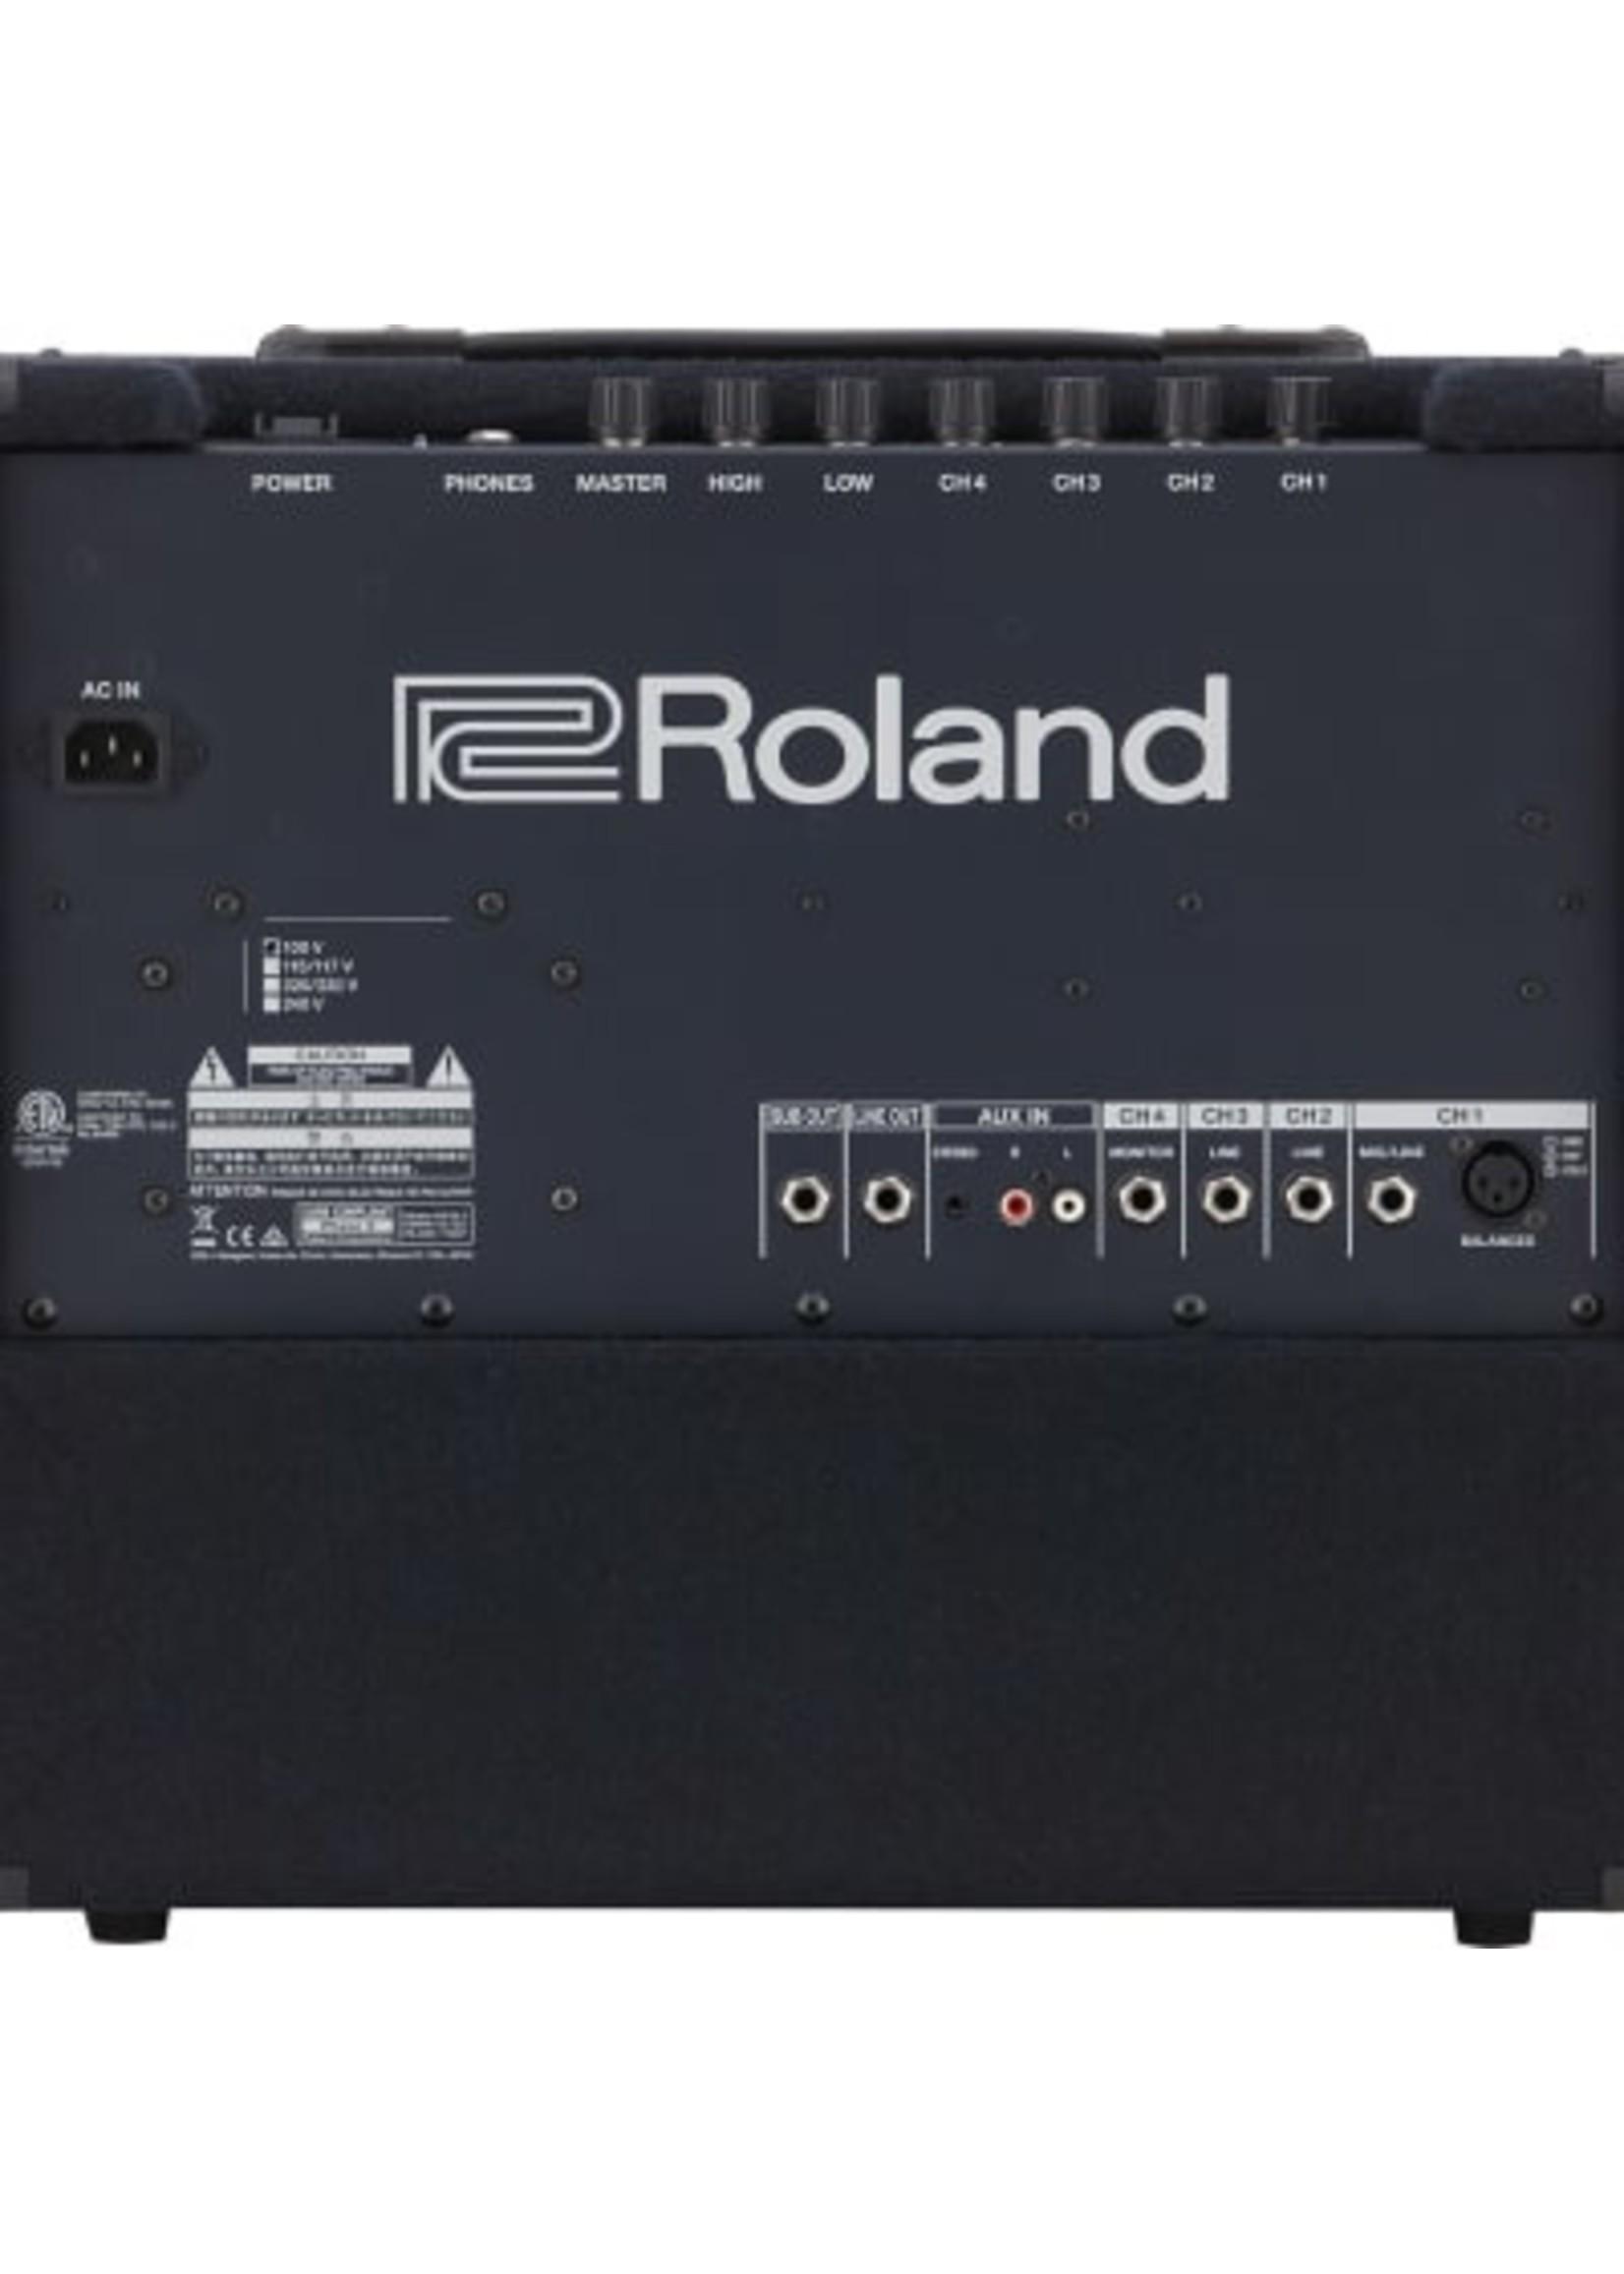 Roland Roland KC-200 Keyboard Amplifier